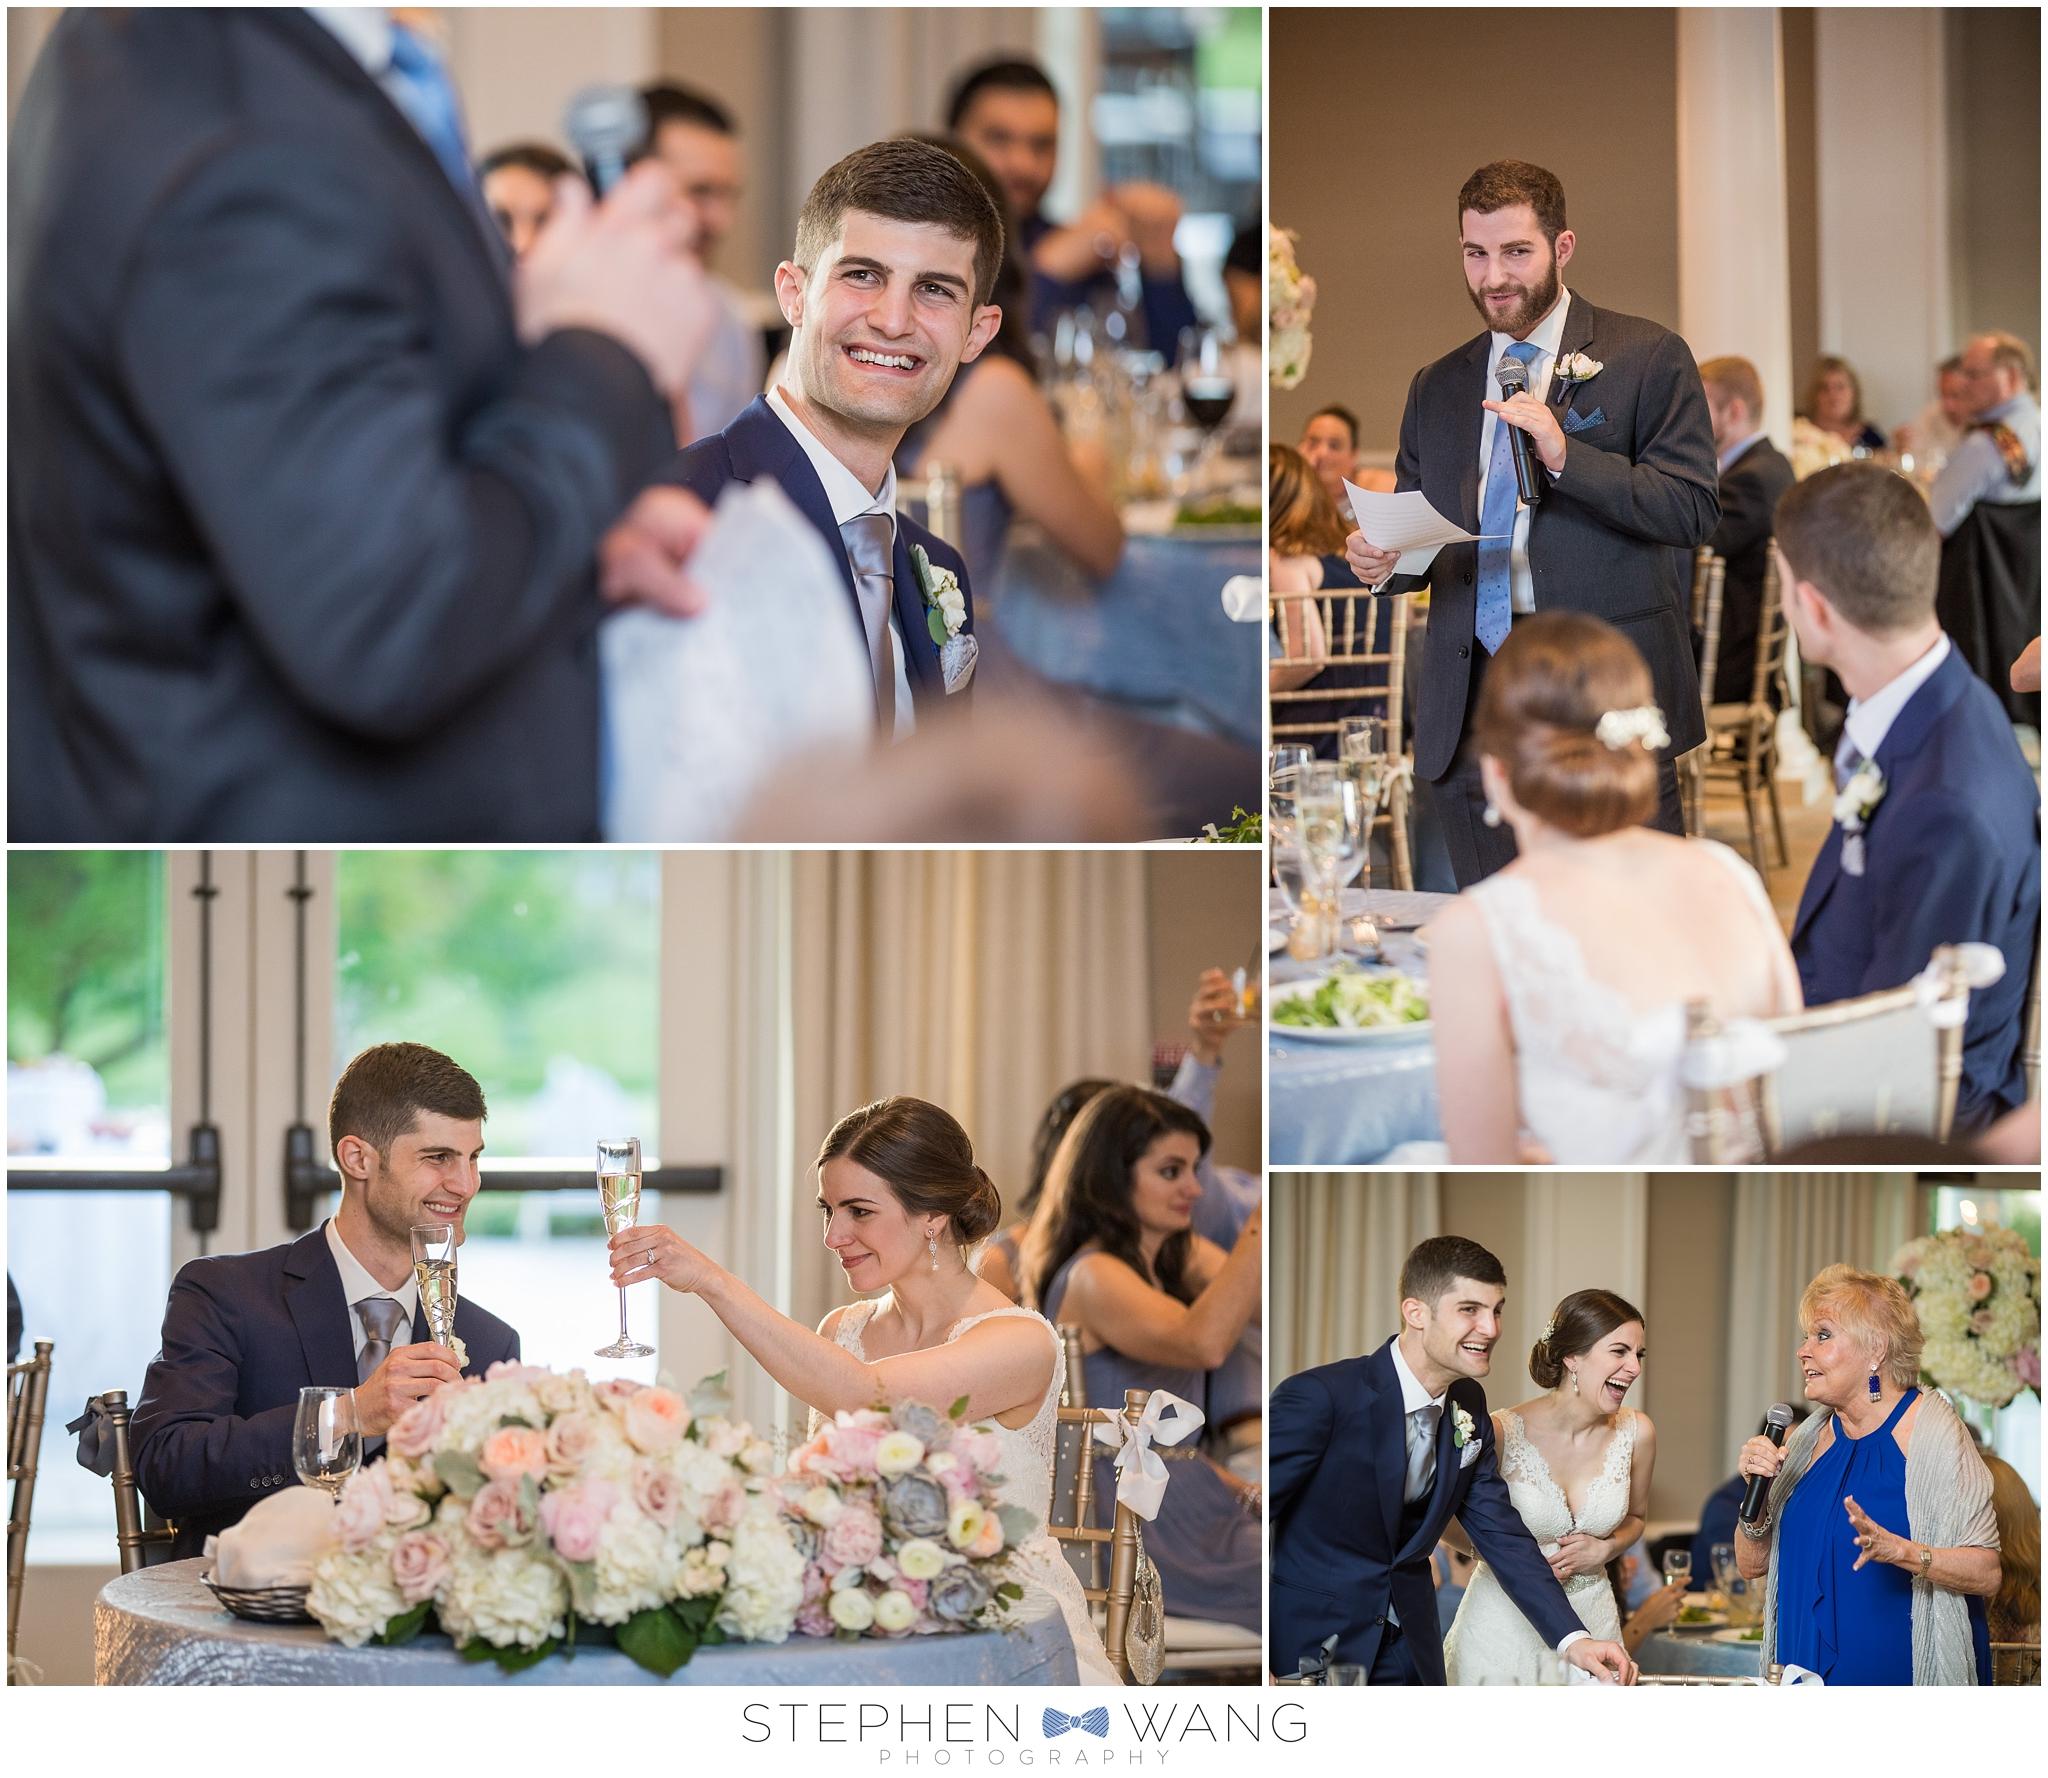 Stephen Wang Photography Shorehaven Norwalk CT Wedding Photographer connecticut shoreline shore haven - 34.jpg